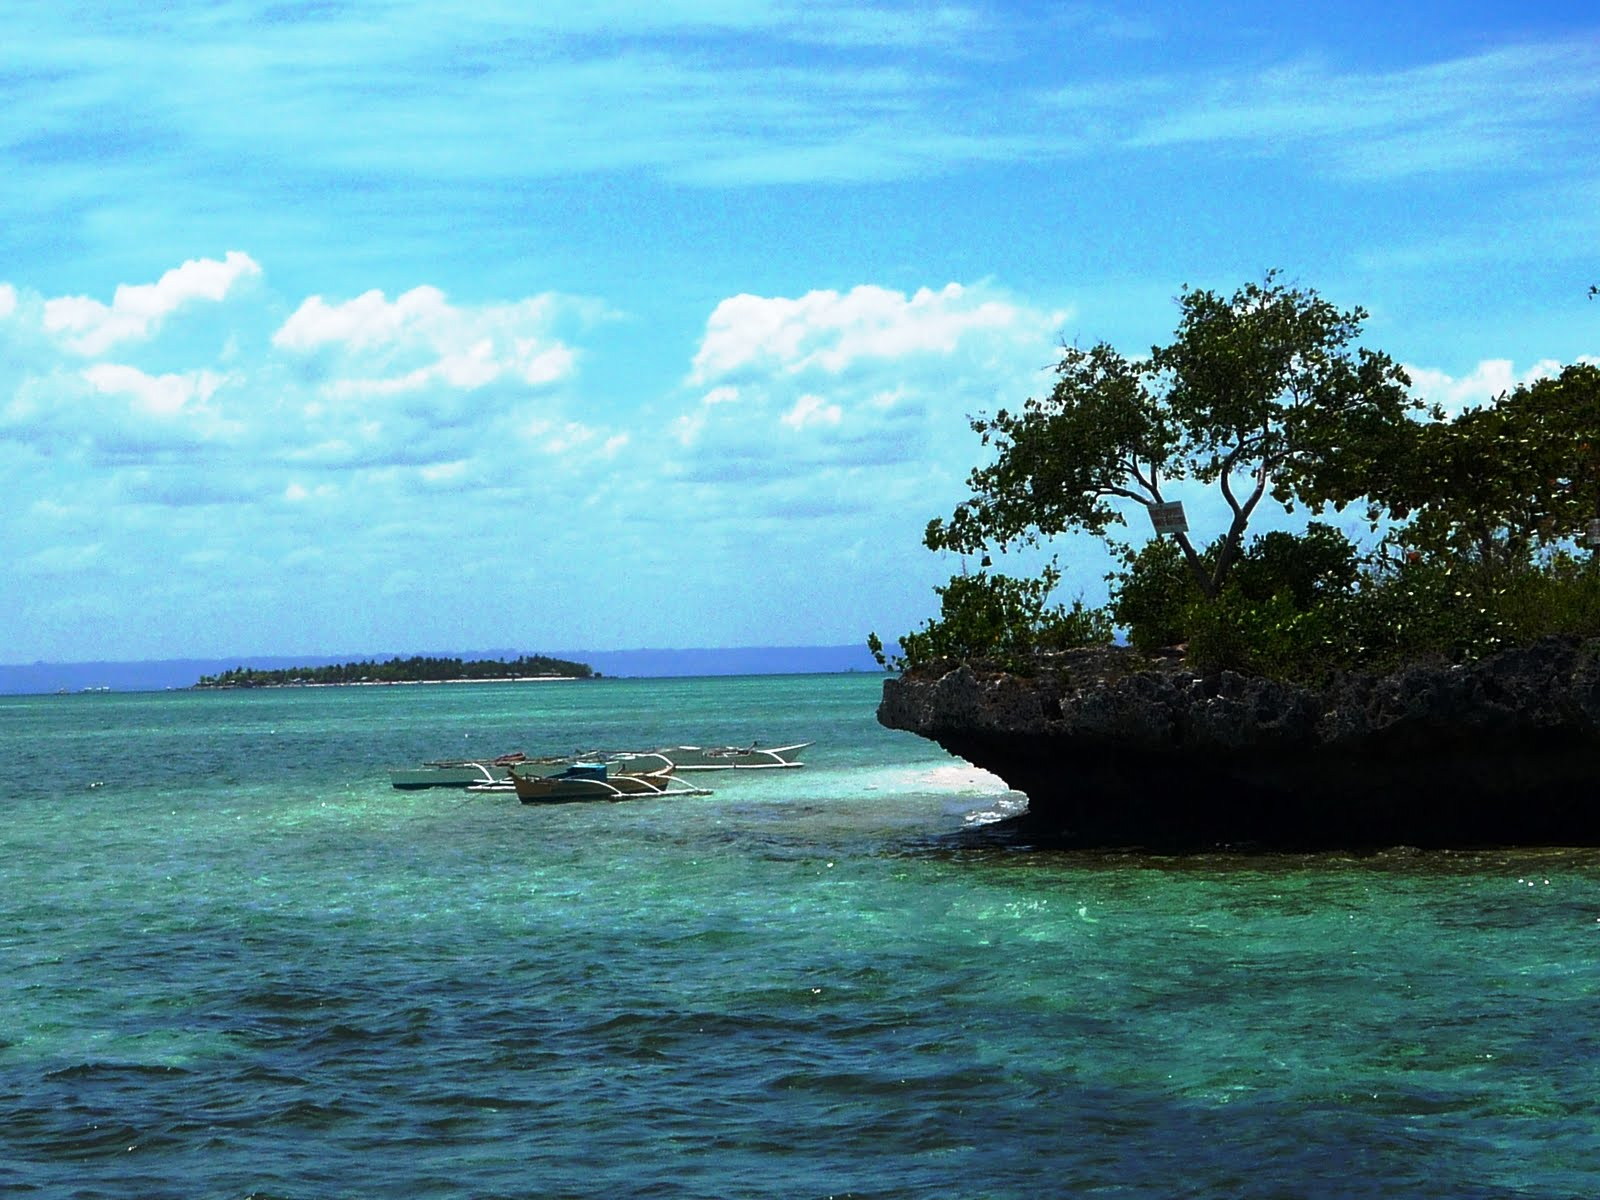 miranda sulpa an island in the sun my world tuesday. Black Bedroom Furniture Sets. Home Design Ideas